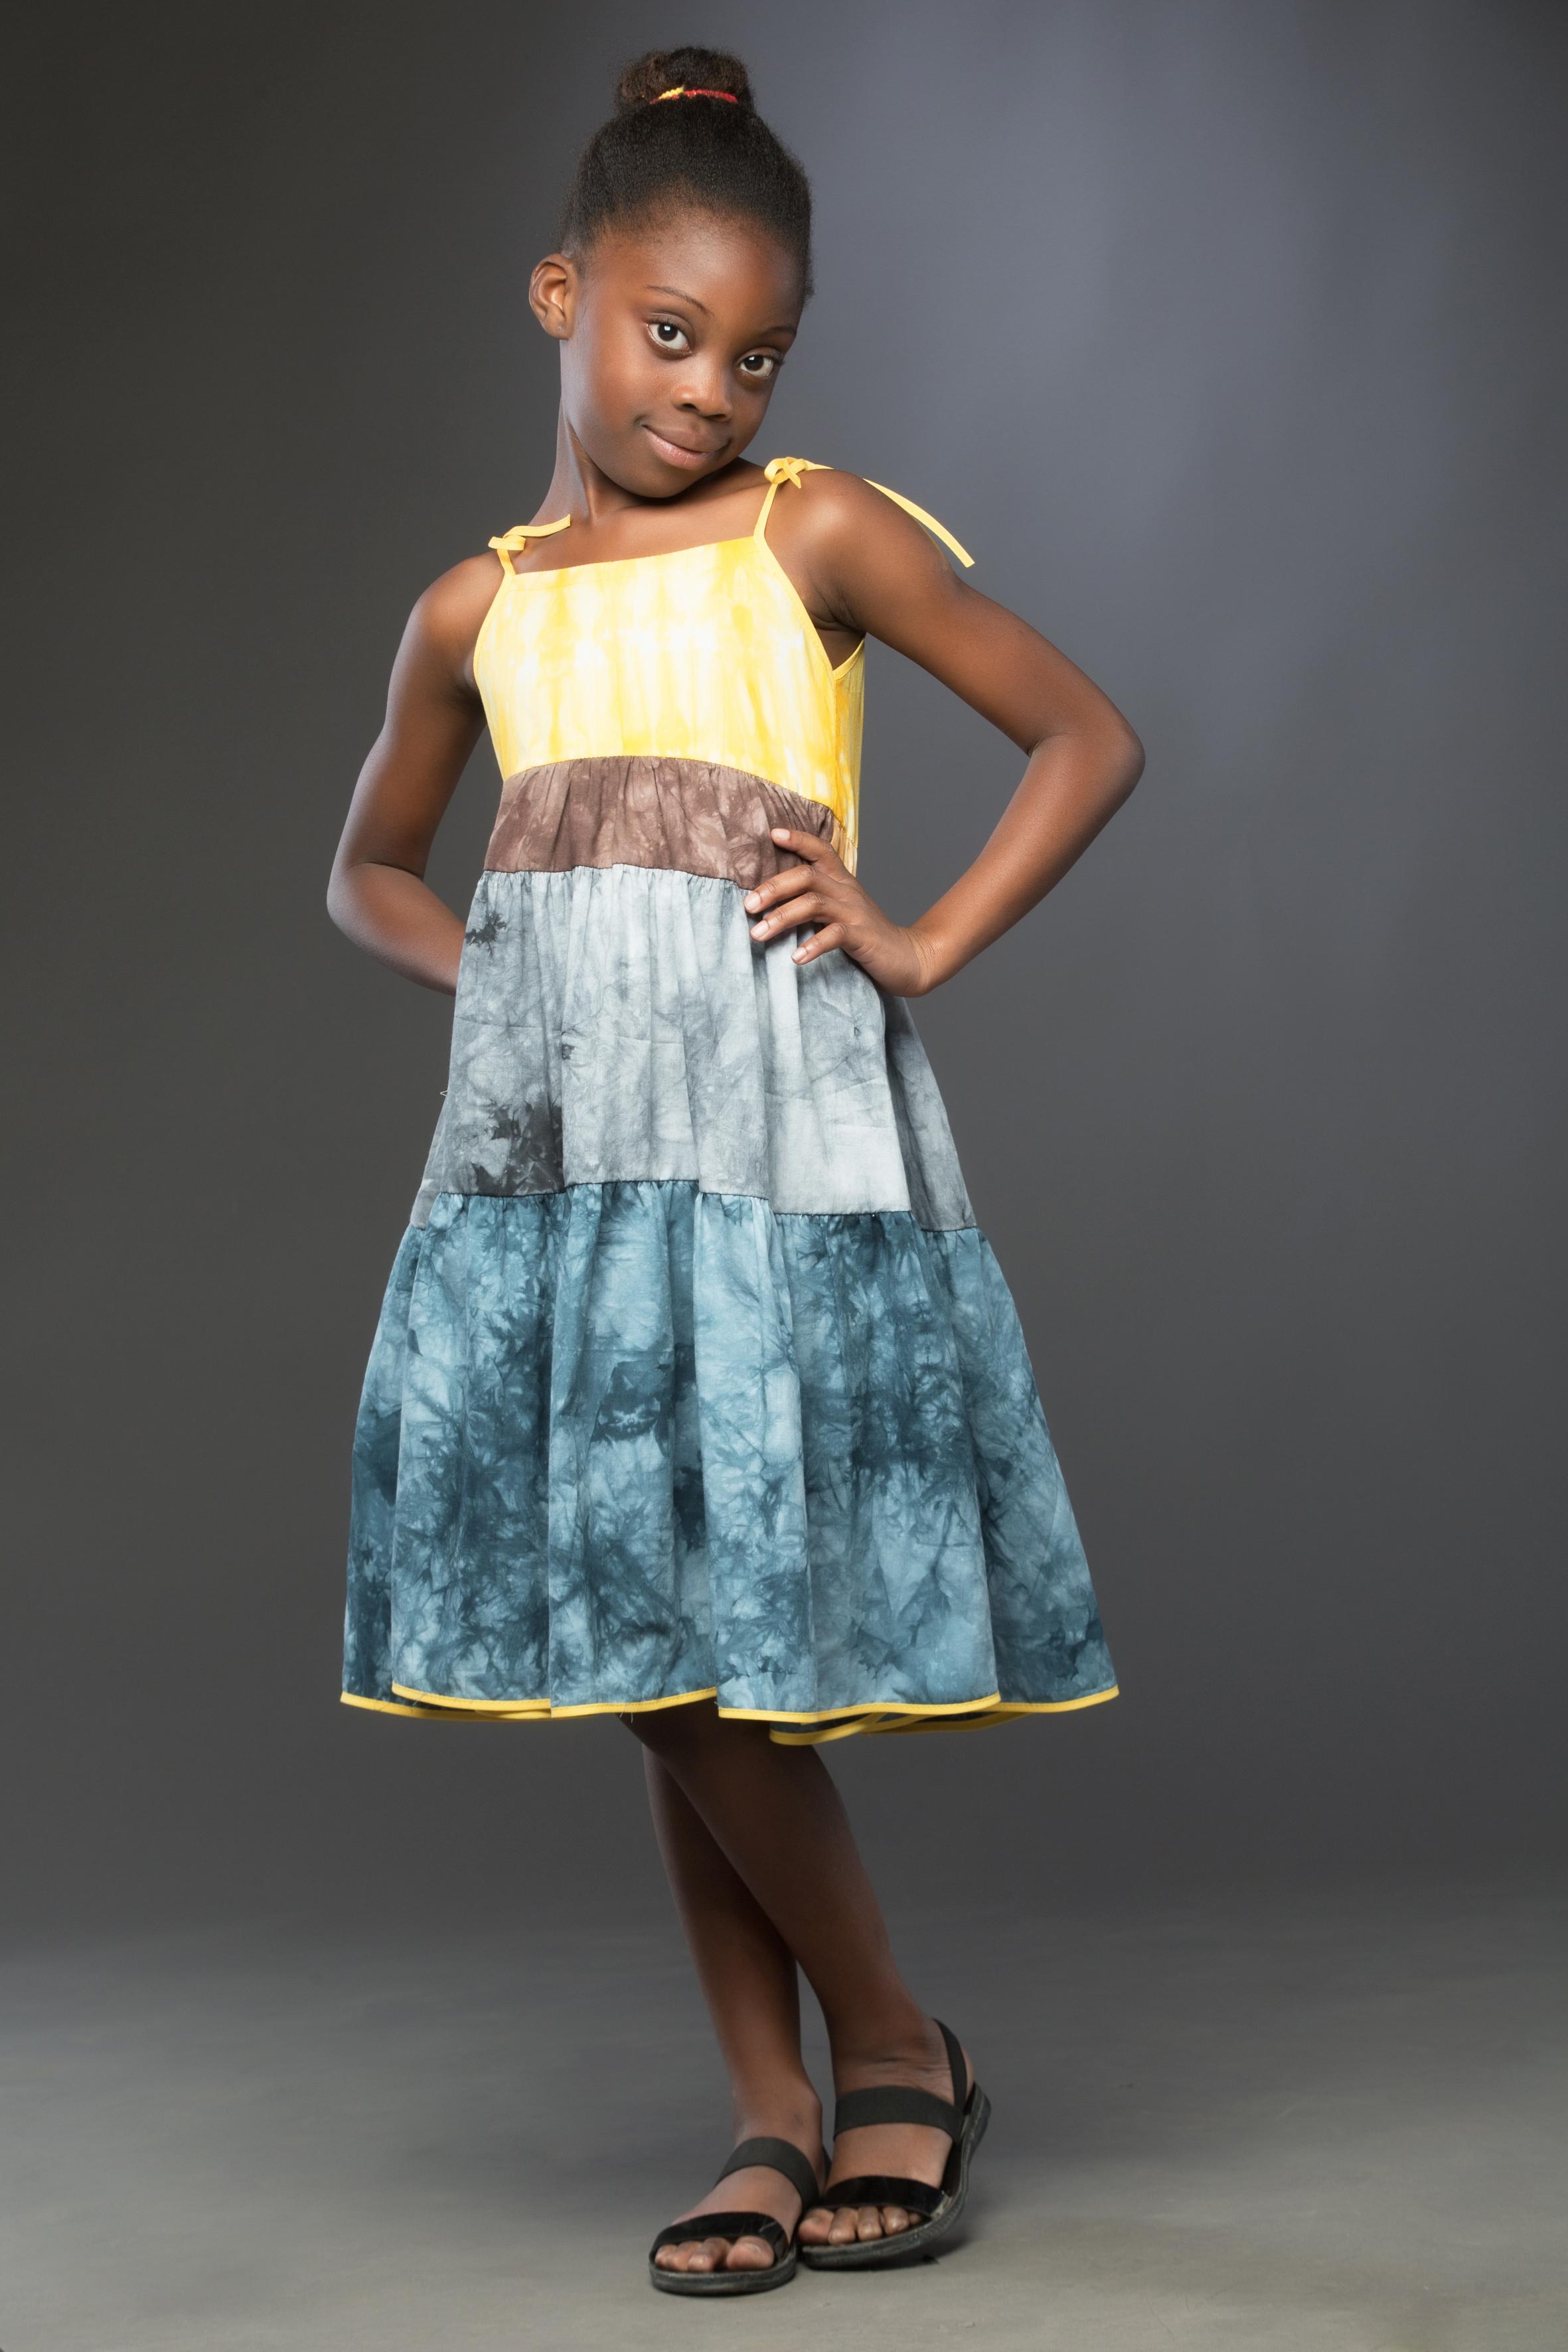 Indigo Dress by Nadia Druide